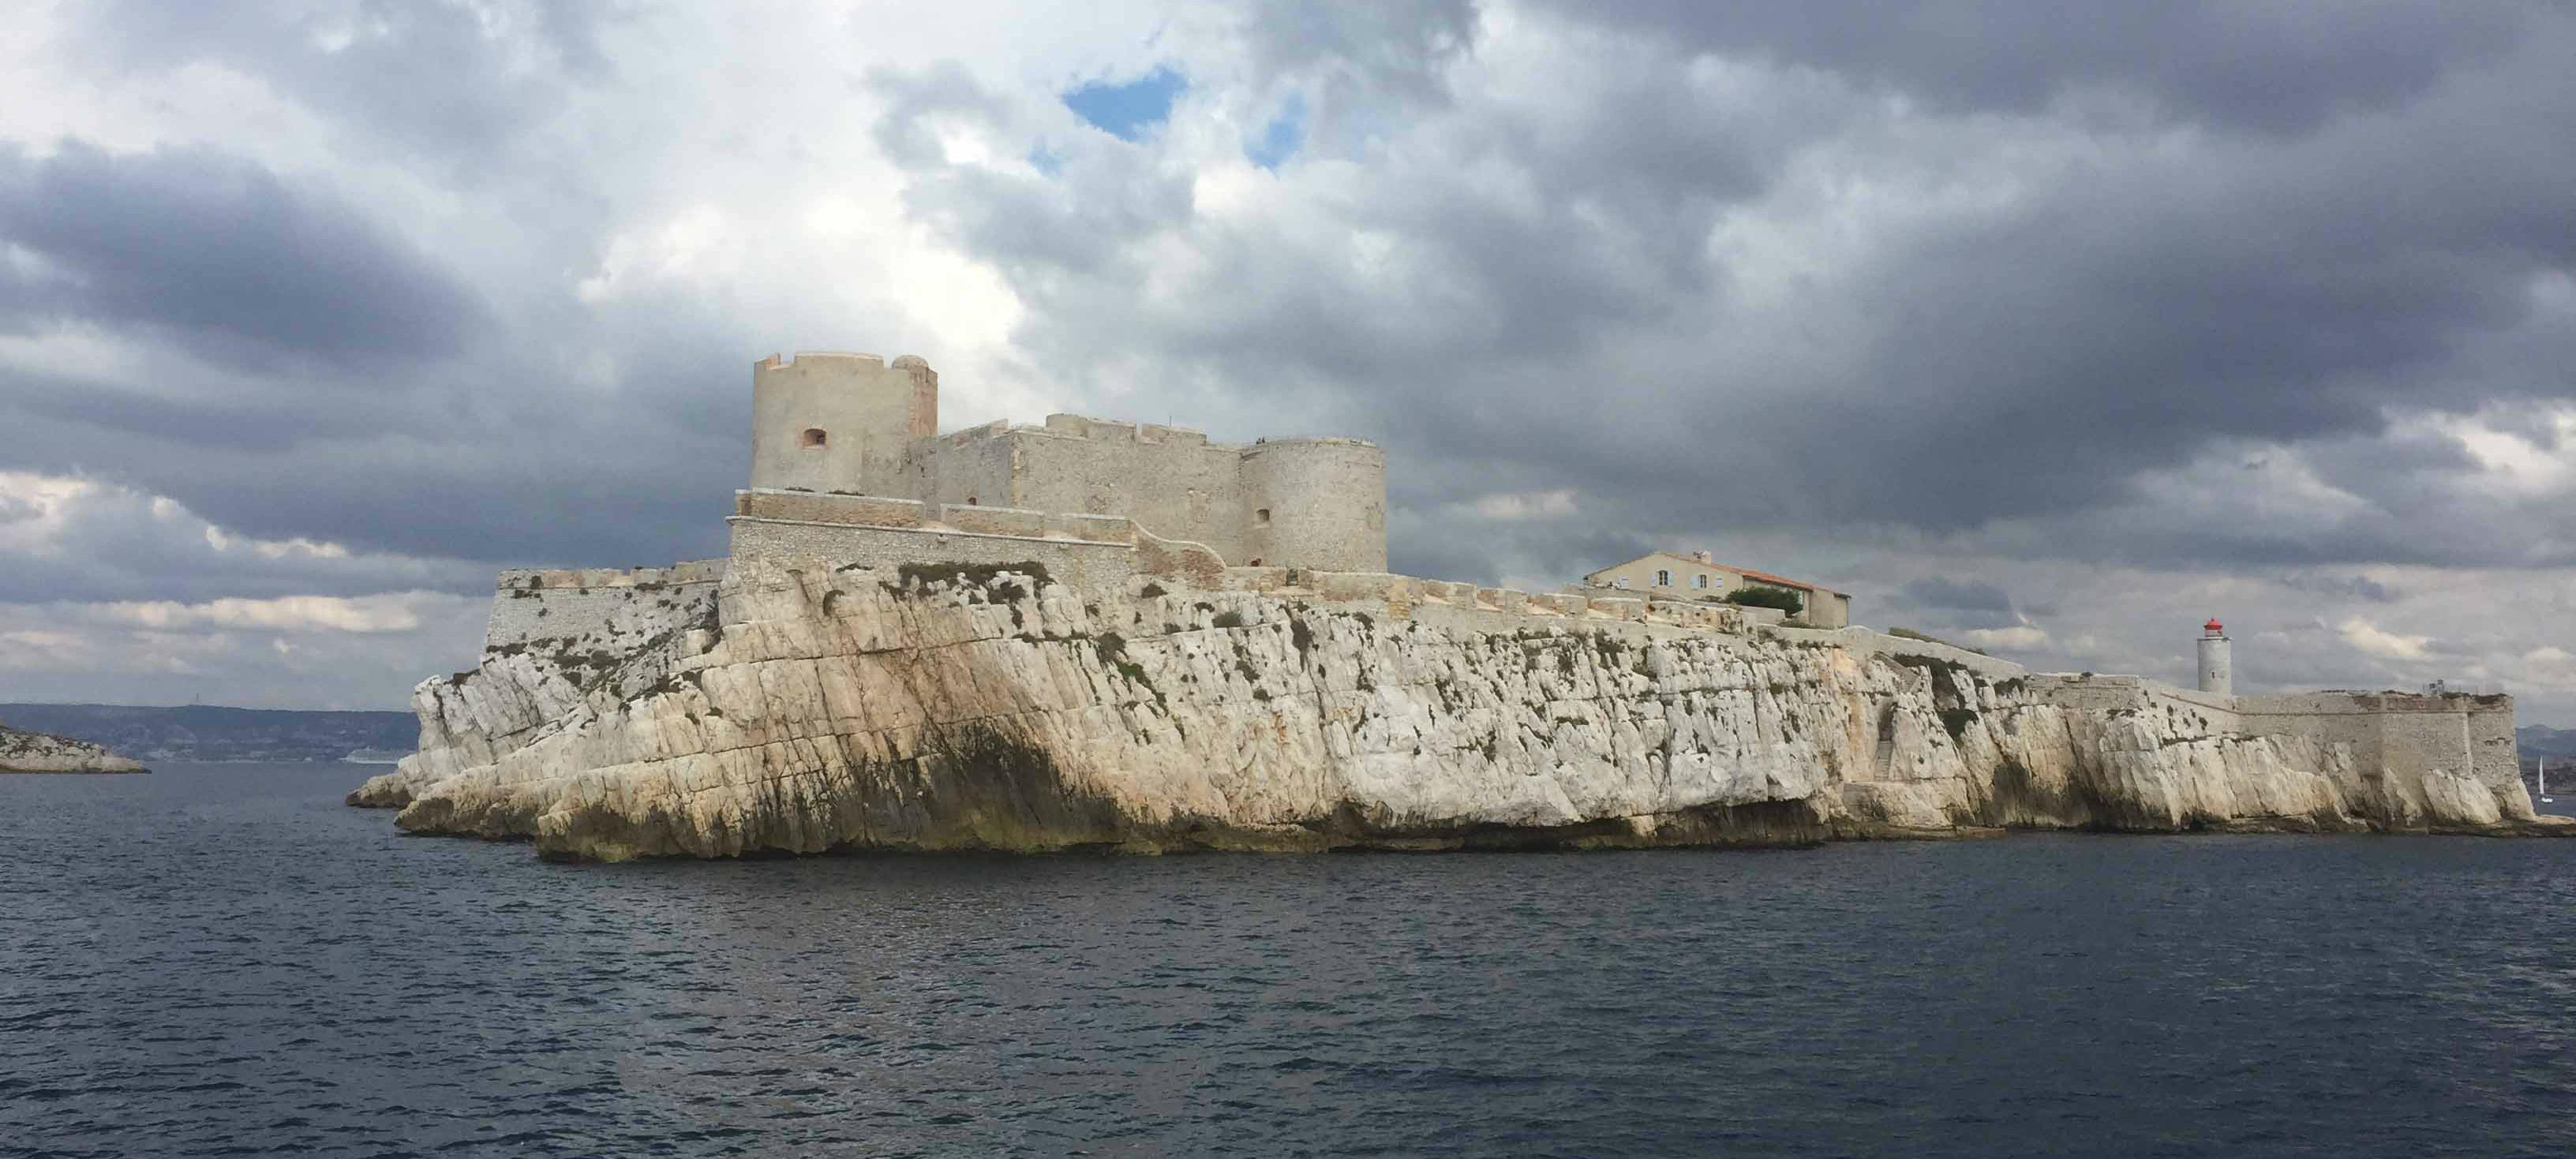 chateau-d'If-(©-Aziz-Mébarki)